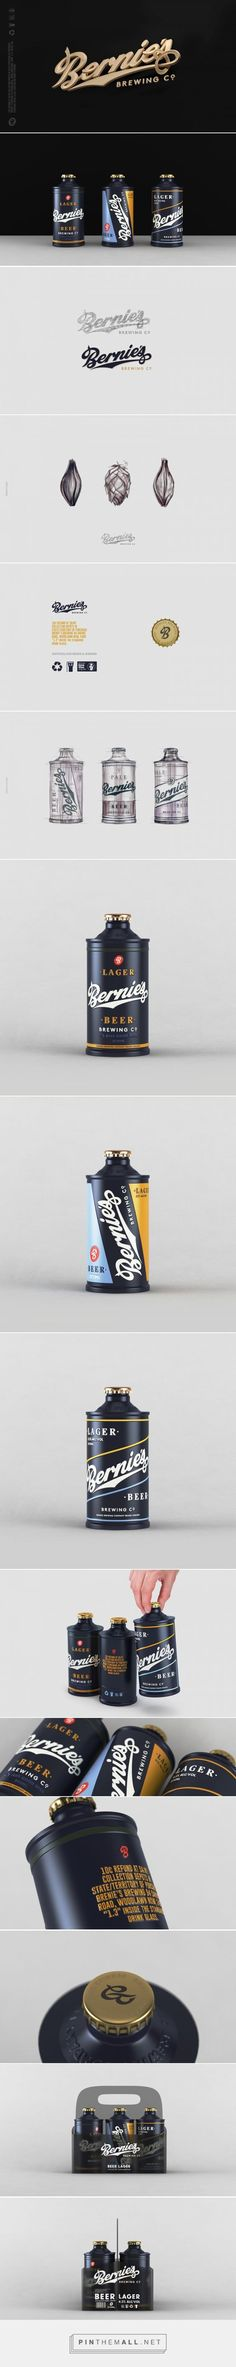 Bernie's Beer Packaging by Erik Musin | Fivestar Branding Agency – Design and Branding Agency & Curated Inspiration Gallery